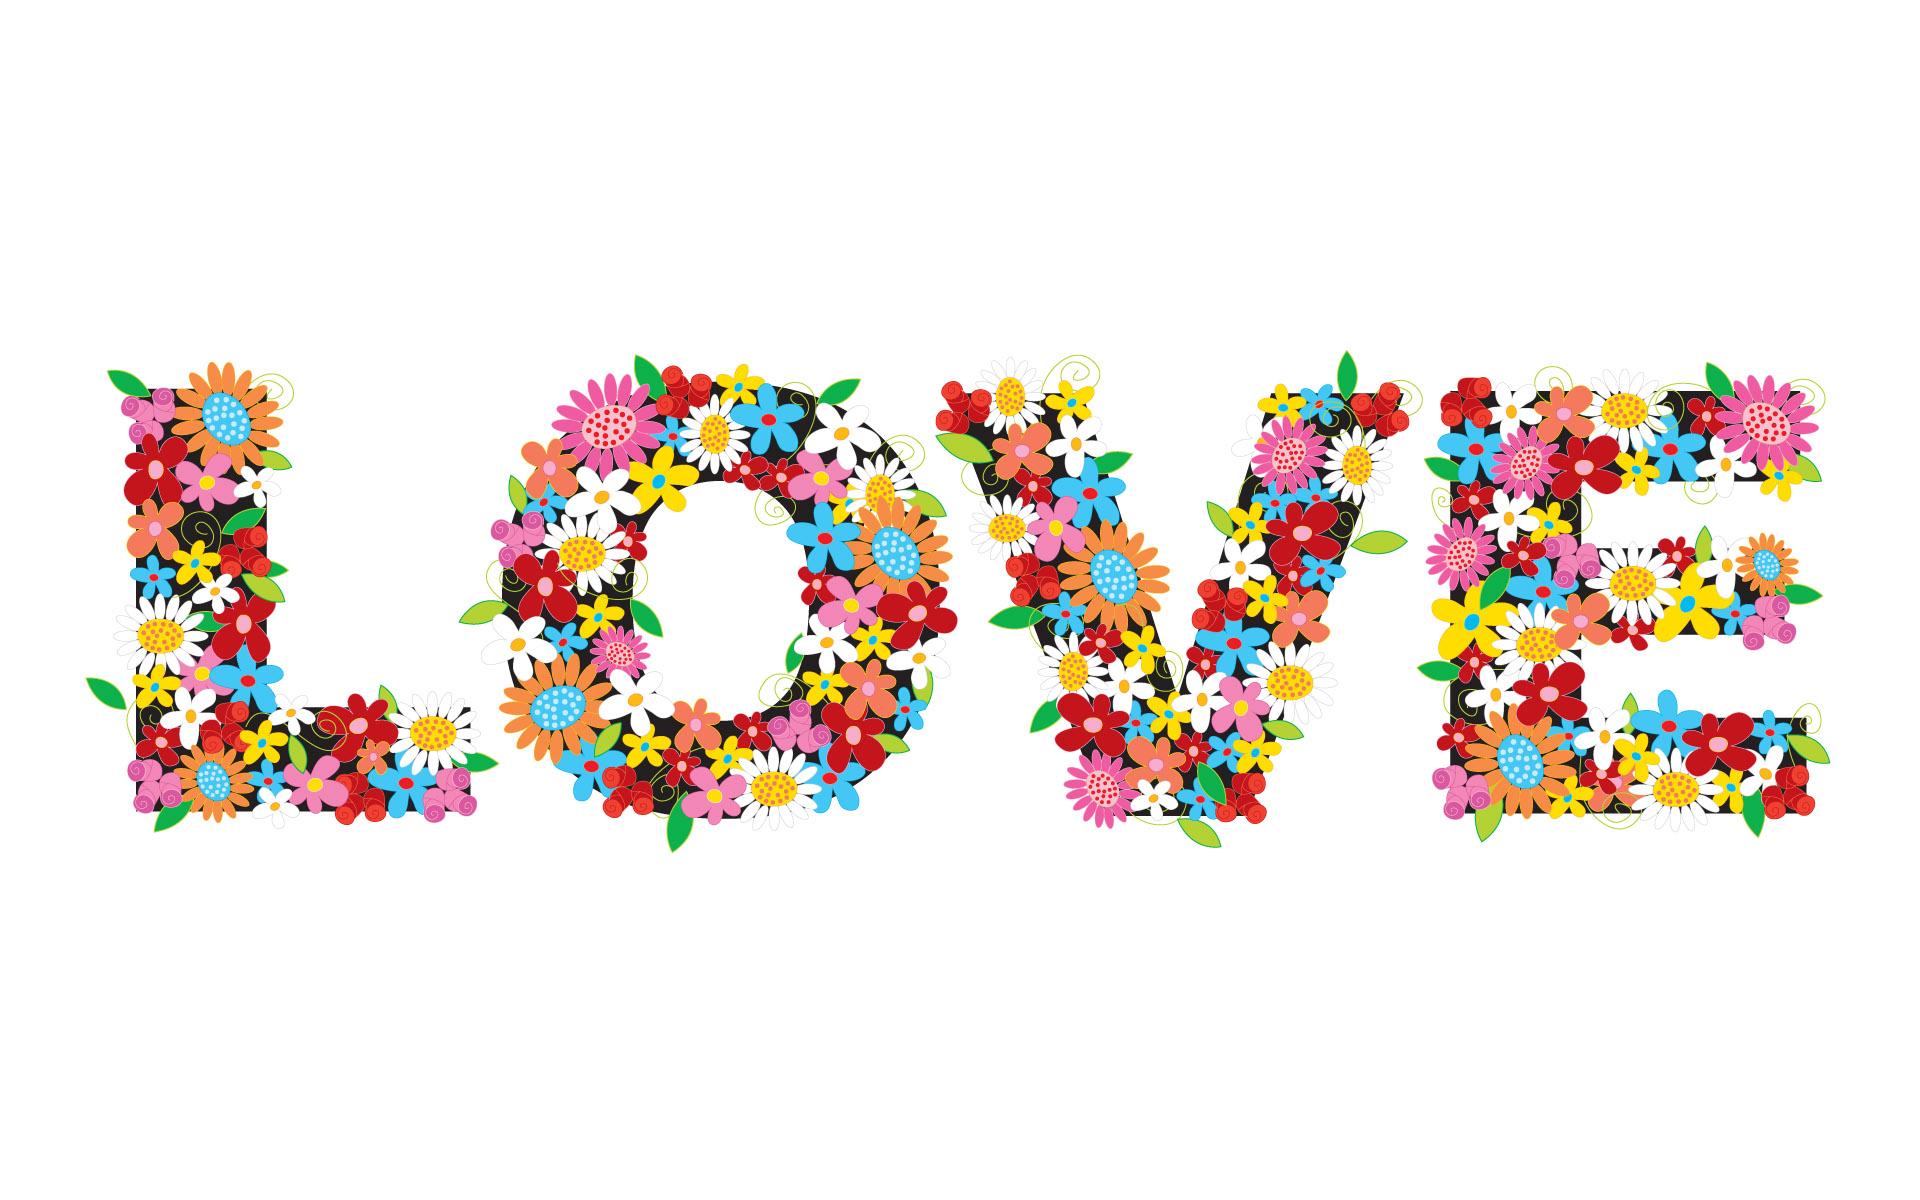 Стол любовь обои на тему любви